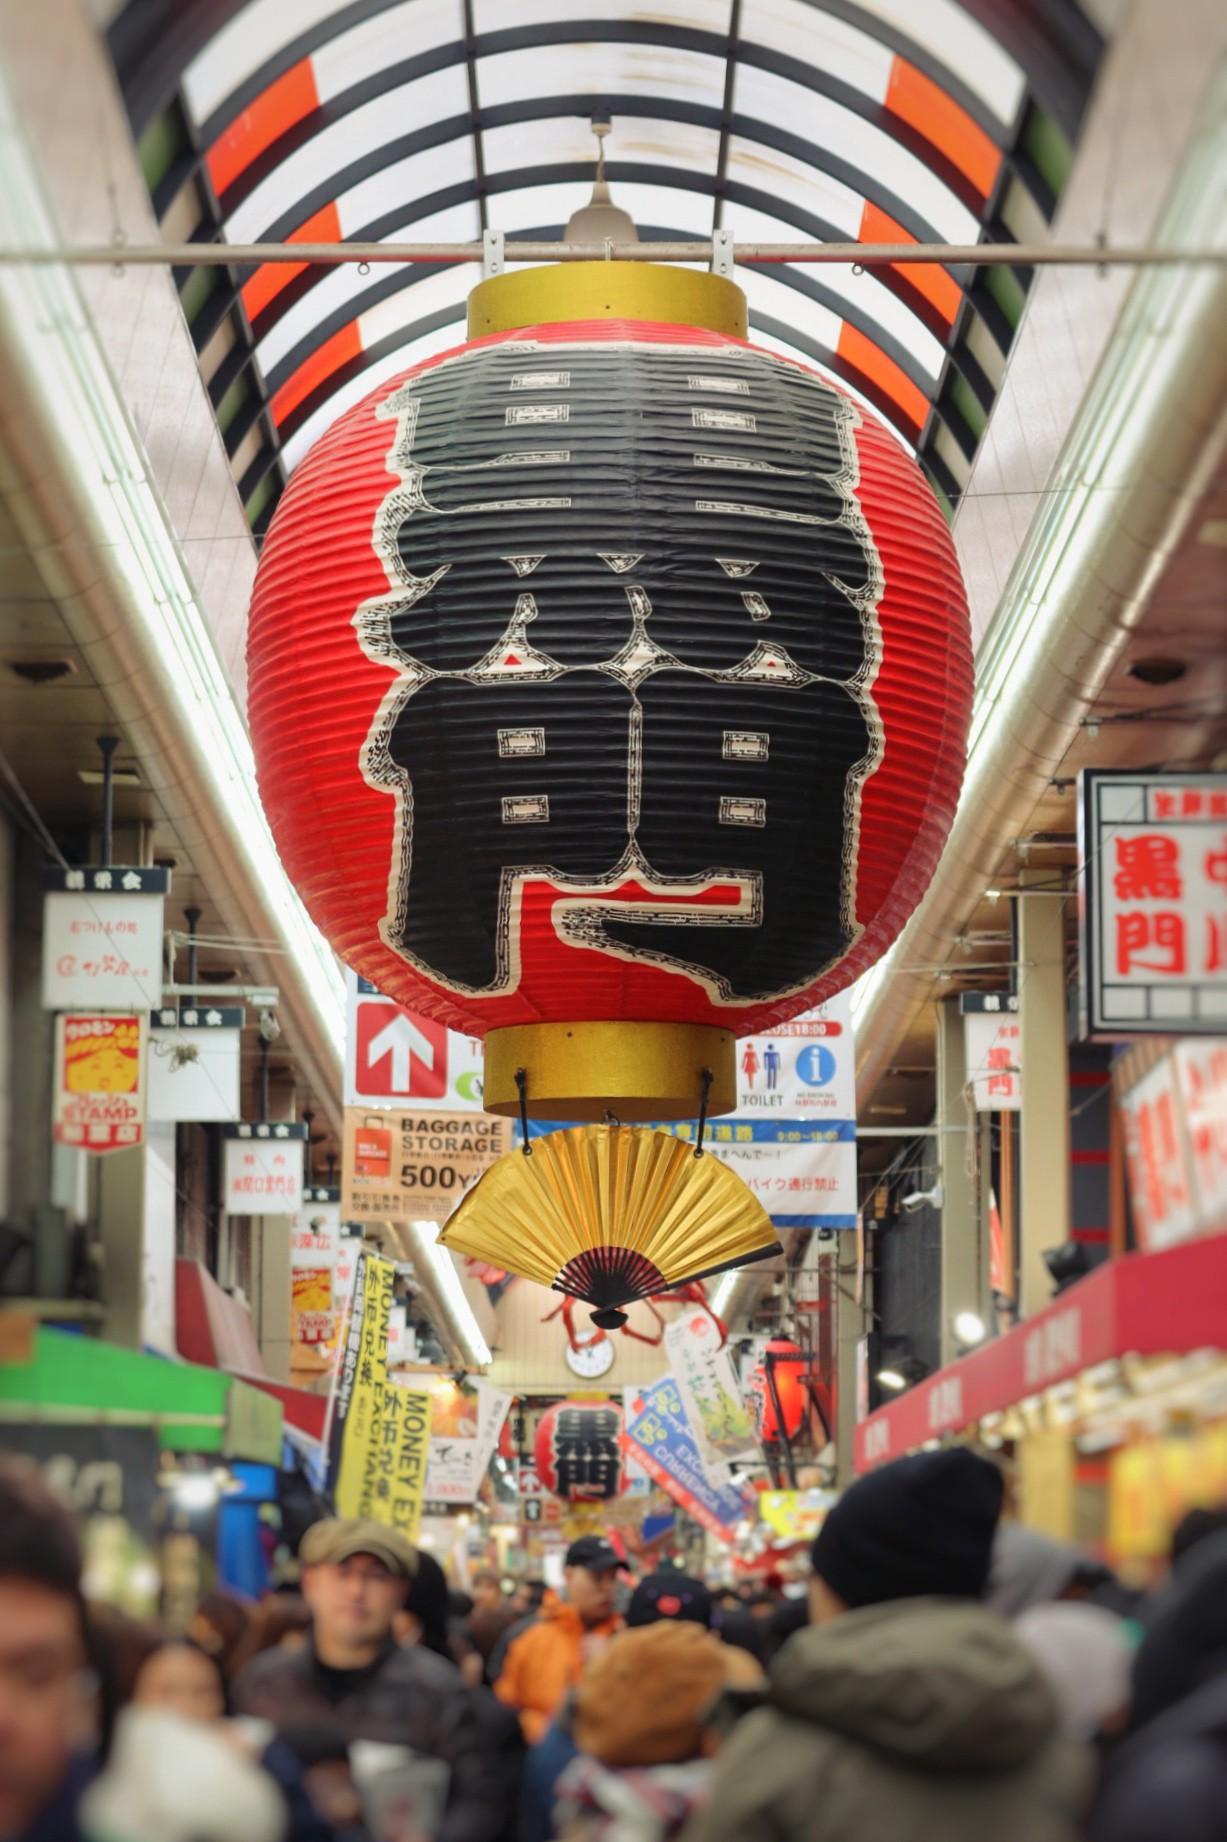 25 Top Things to Do in Osaka : Osaka Bucket List 2019